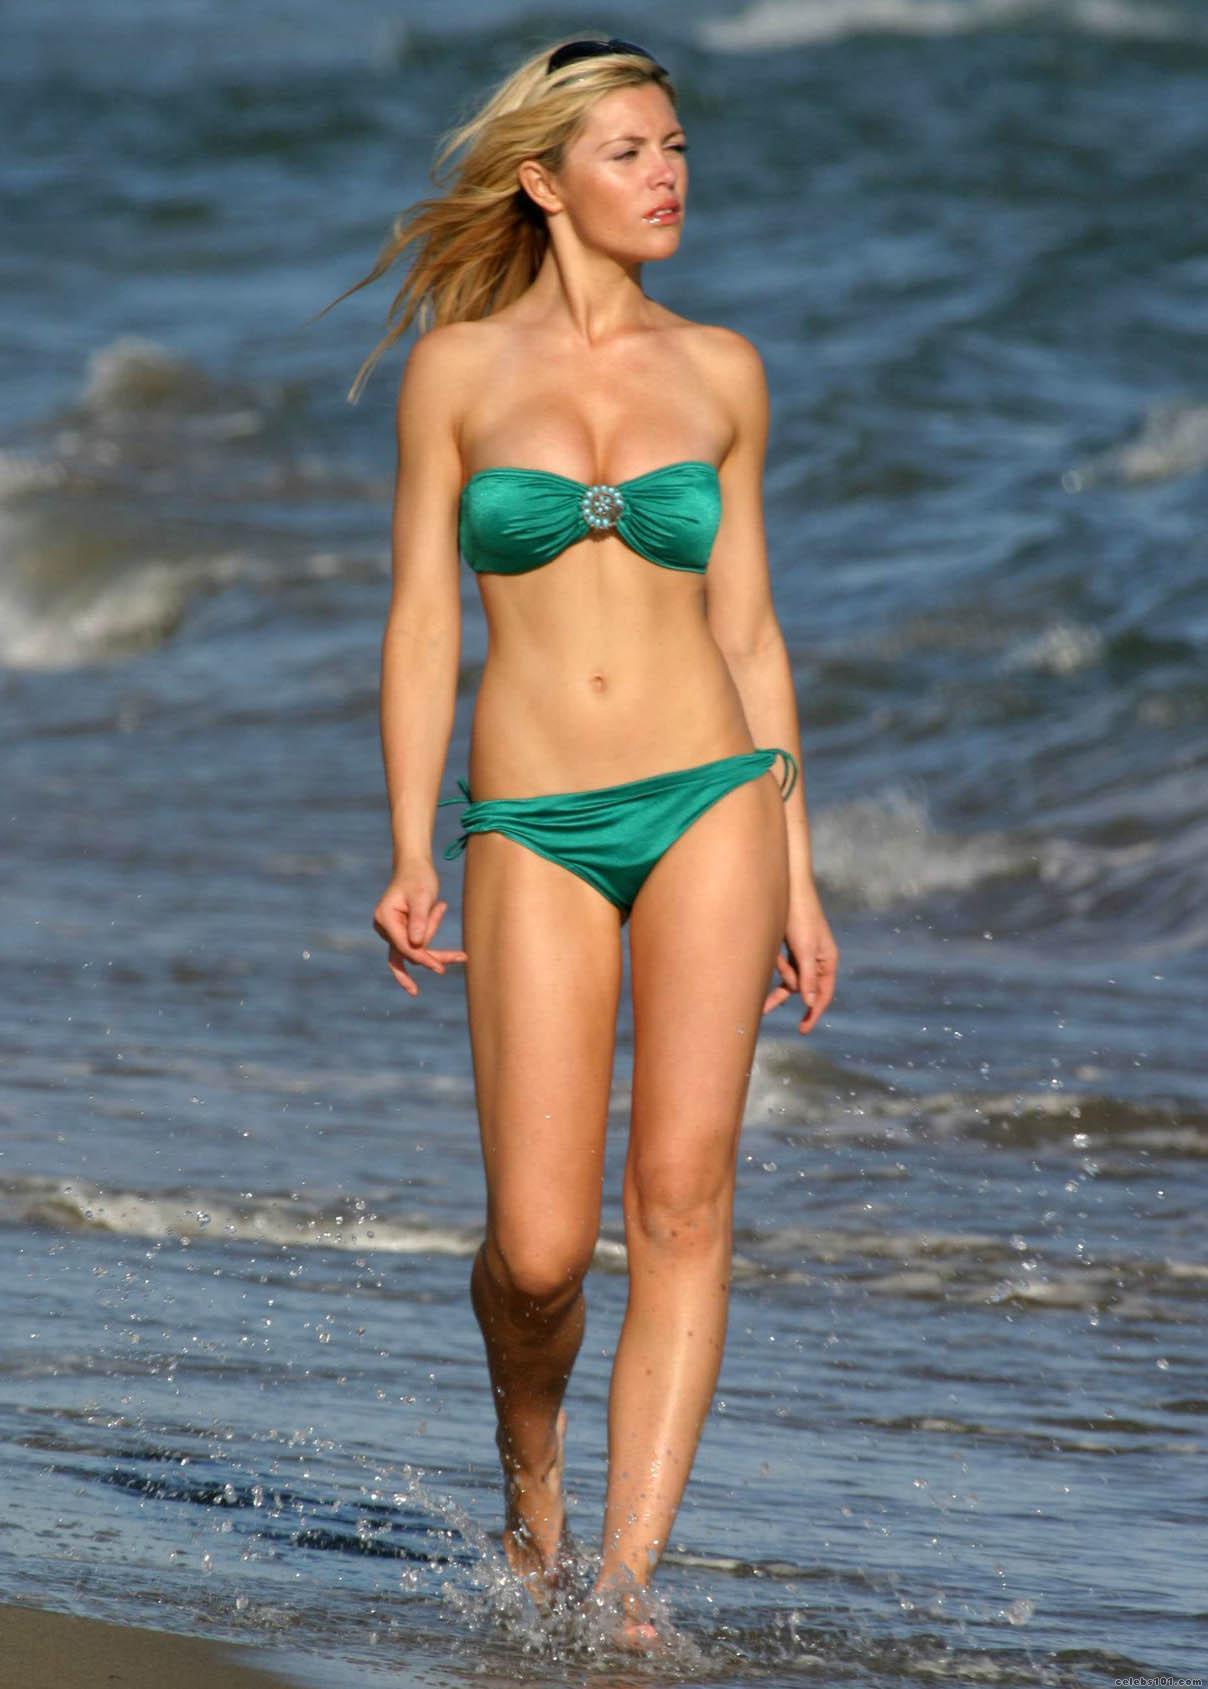 swimsuit Bikini Abbey Clancy naked photo 2017